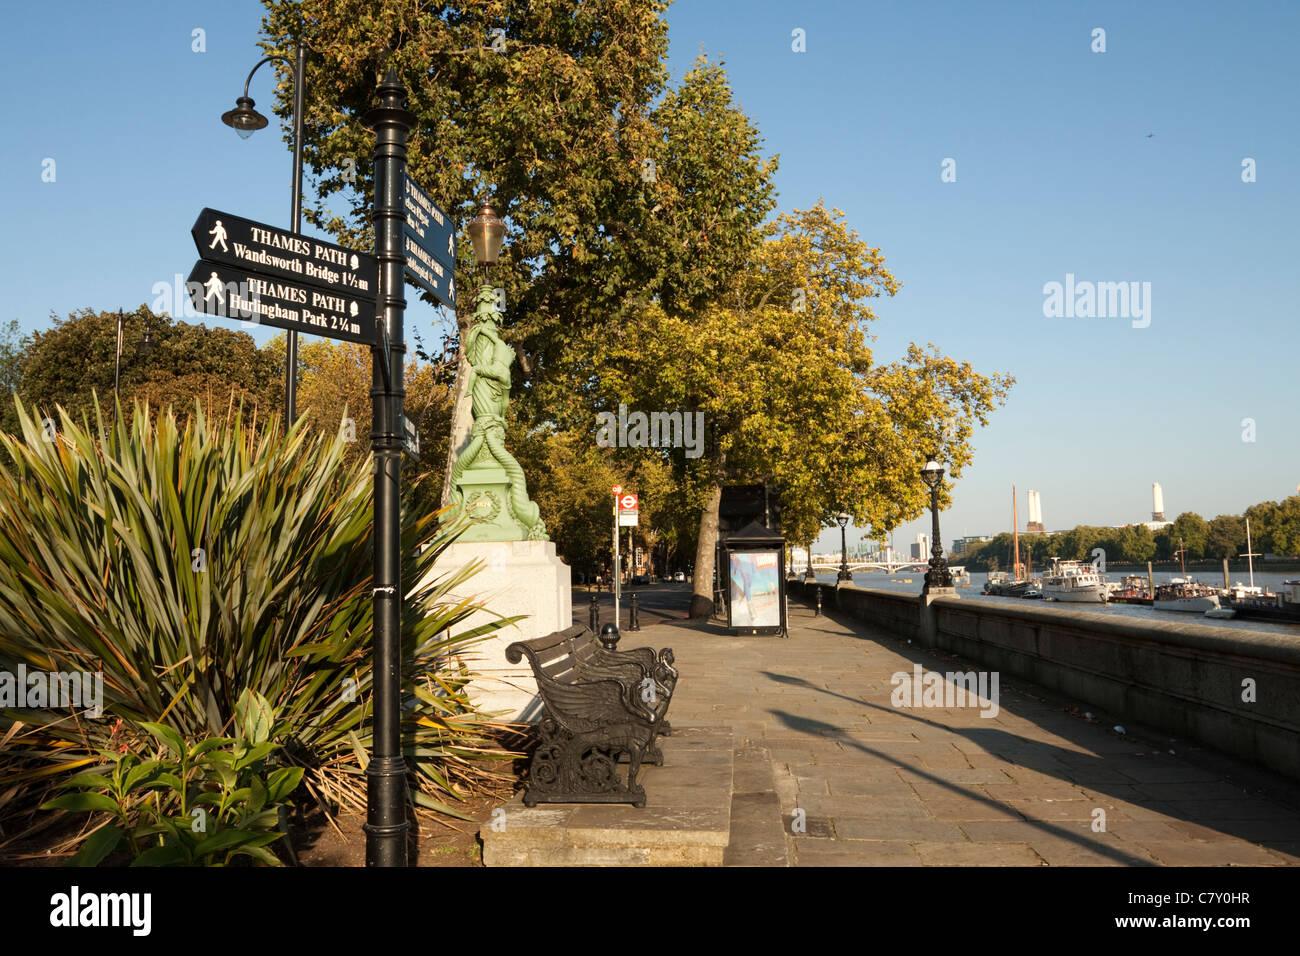 El camino del Támesis, Chelsea Embankment, Londres, Inglaterra, Reino Unido. Foto de stock